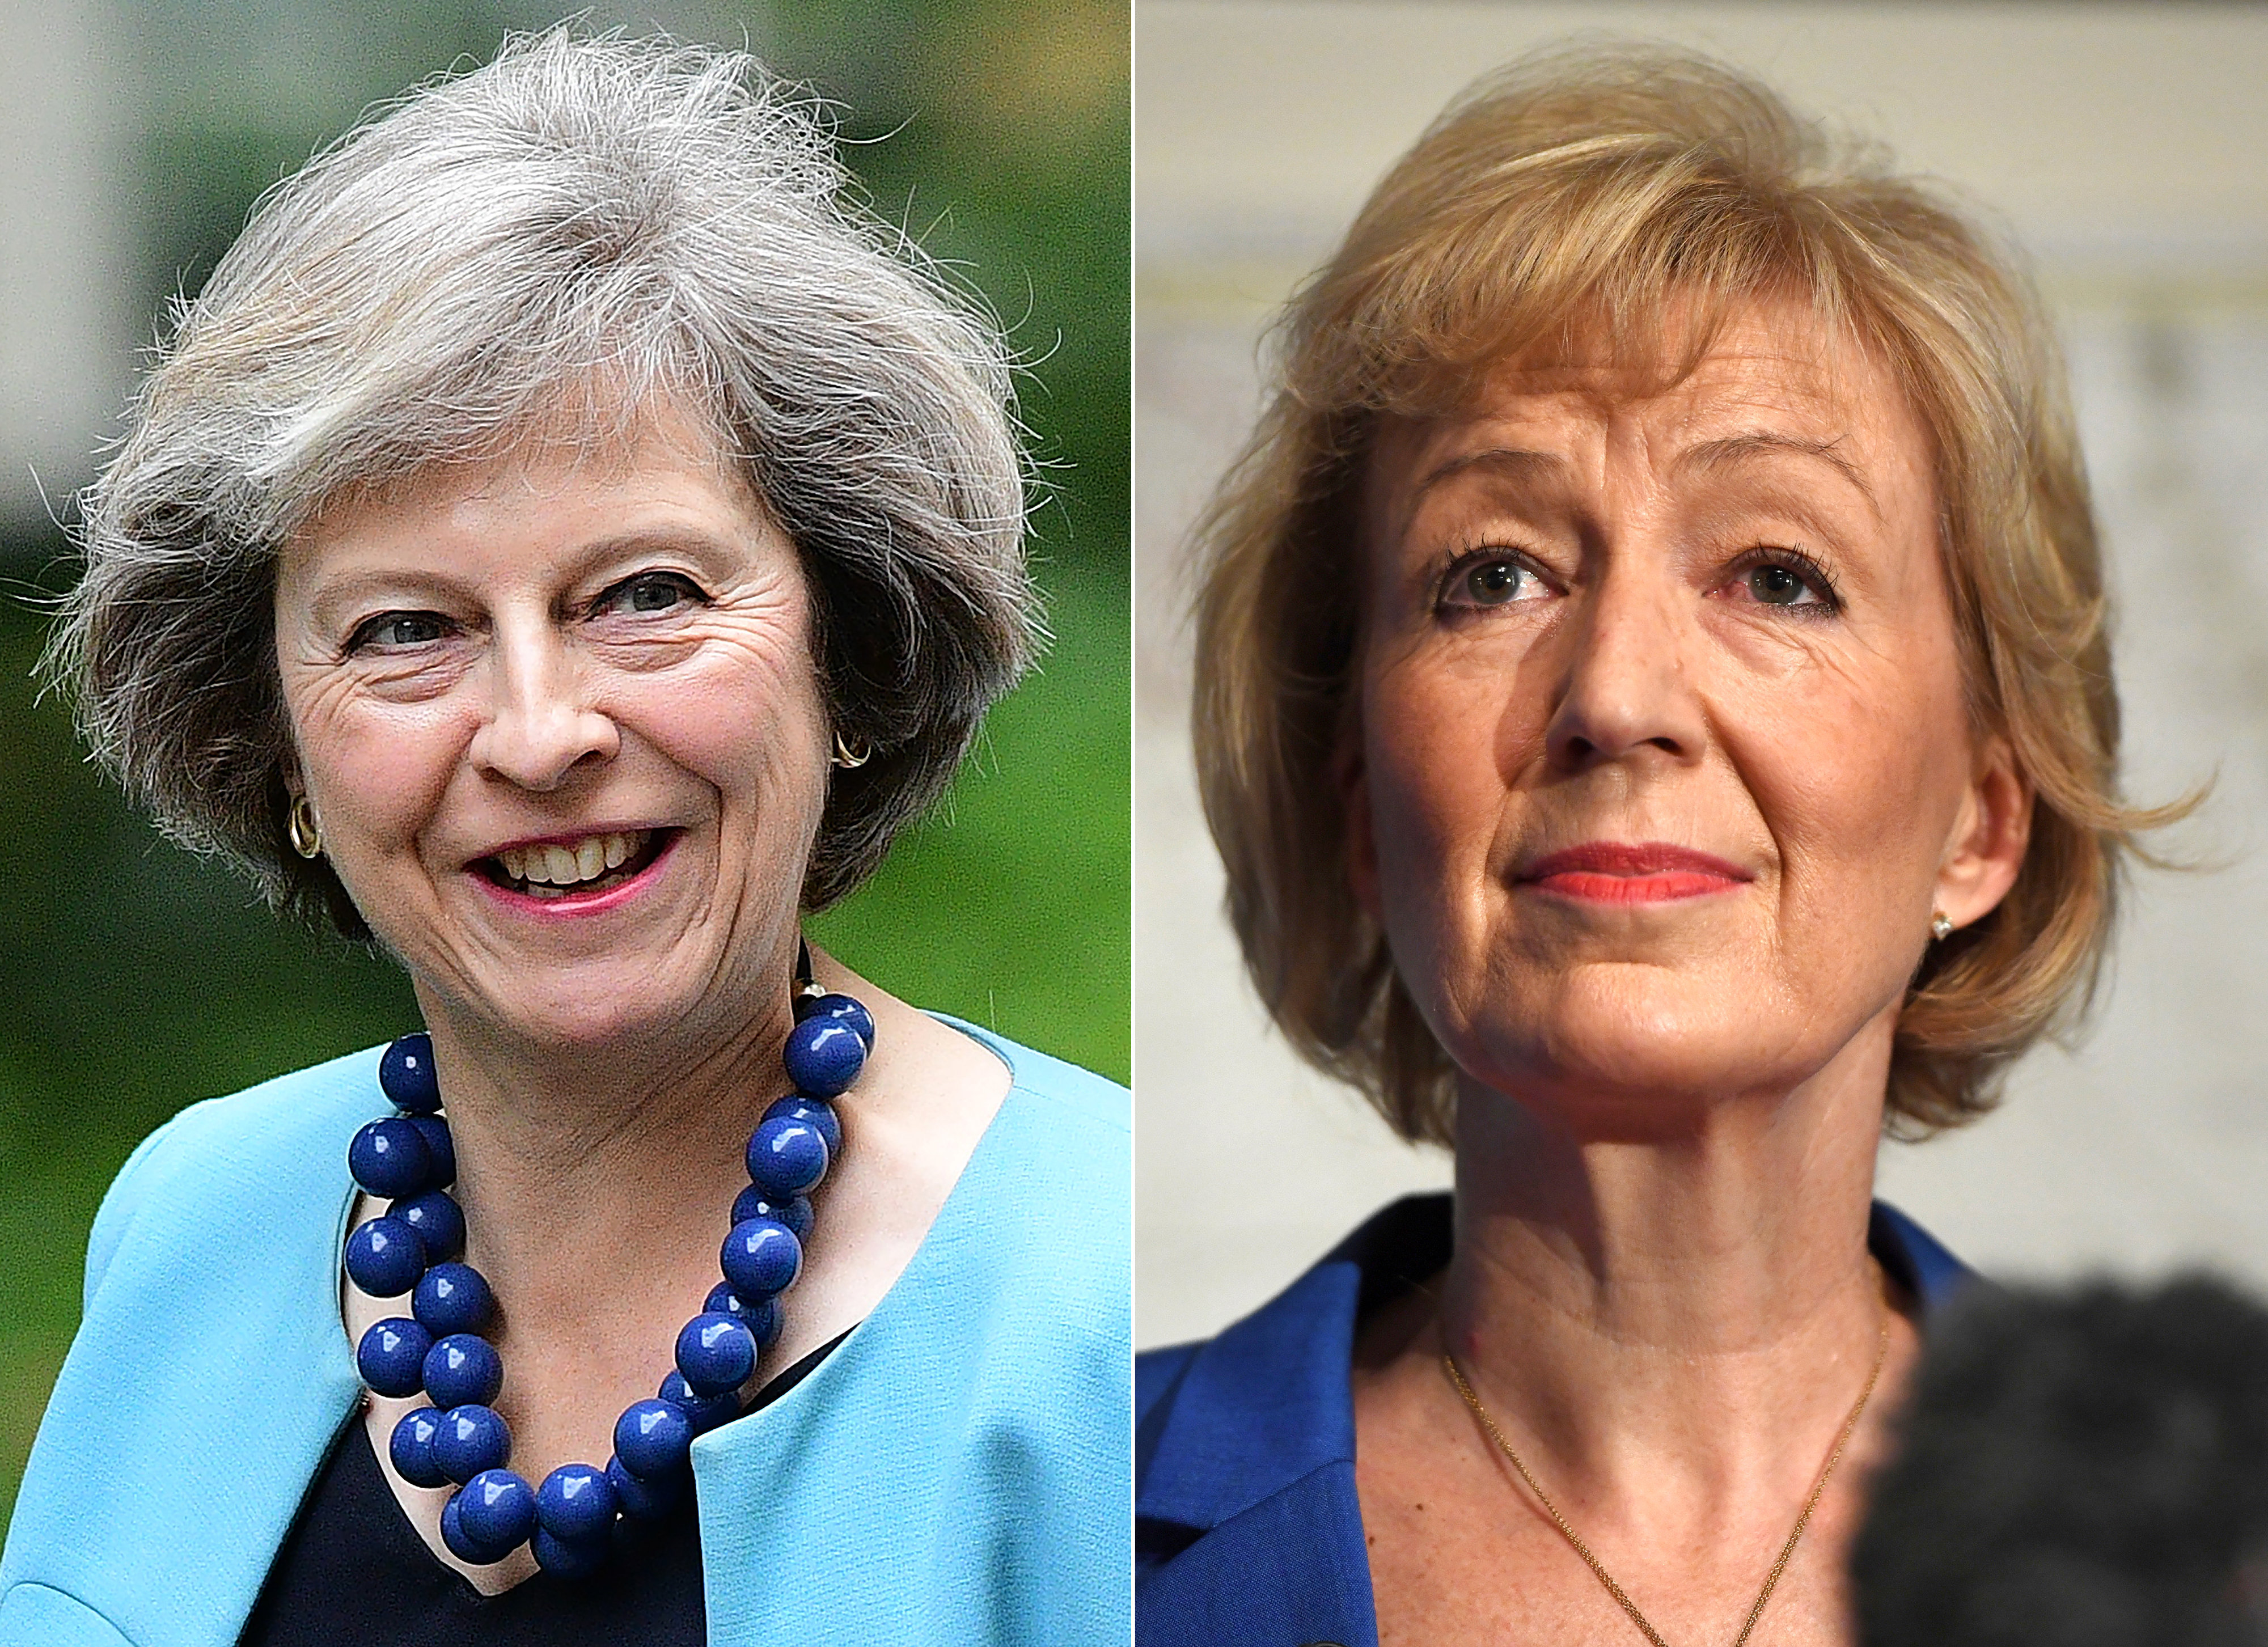 Ministra dos Assuntos Internos Theresa May e a vice-ministra da Energia Andrea Leadsom